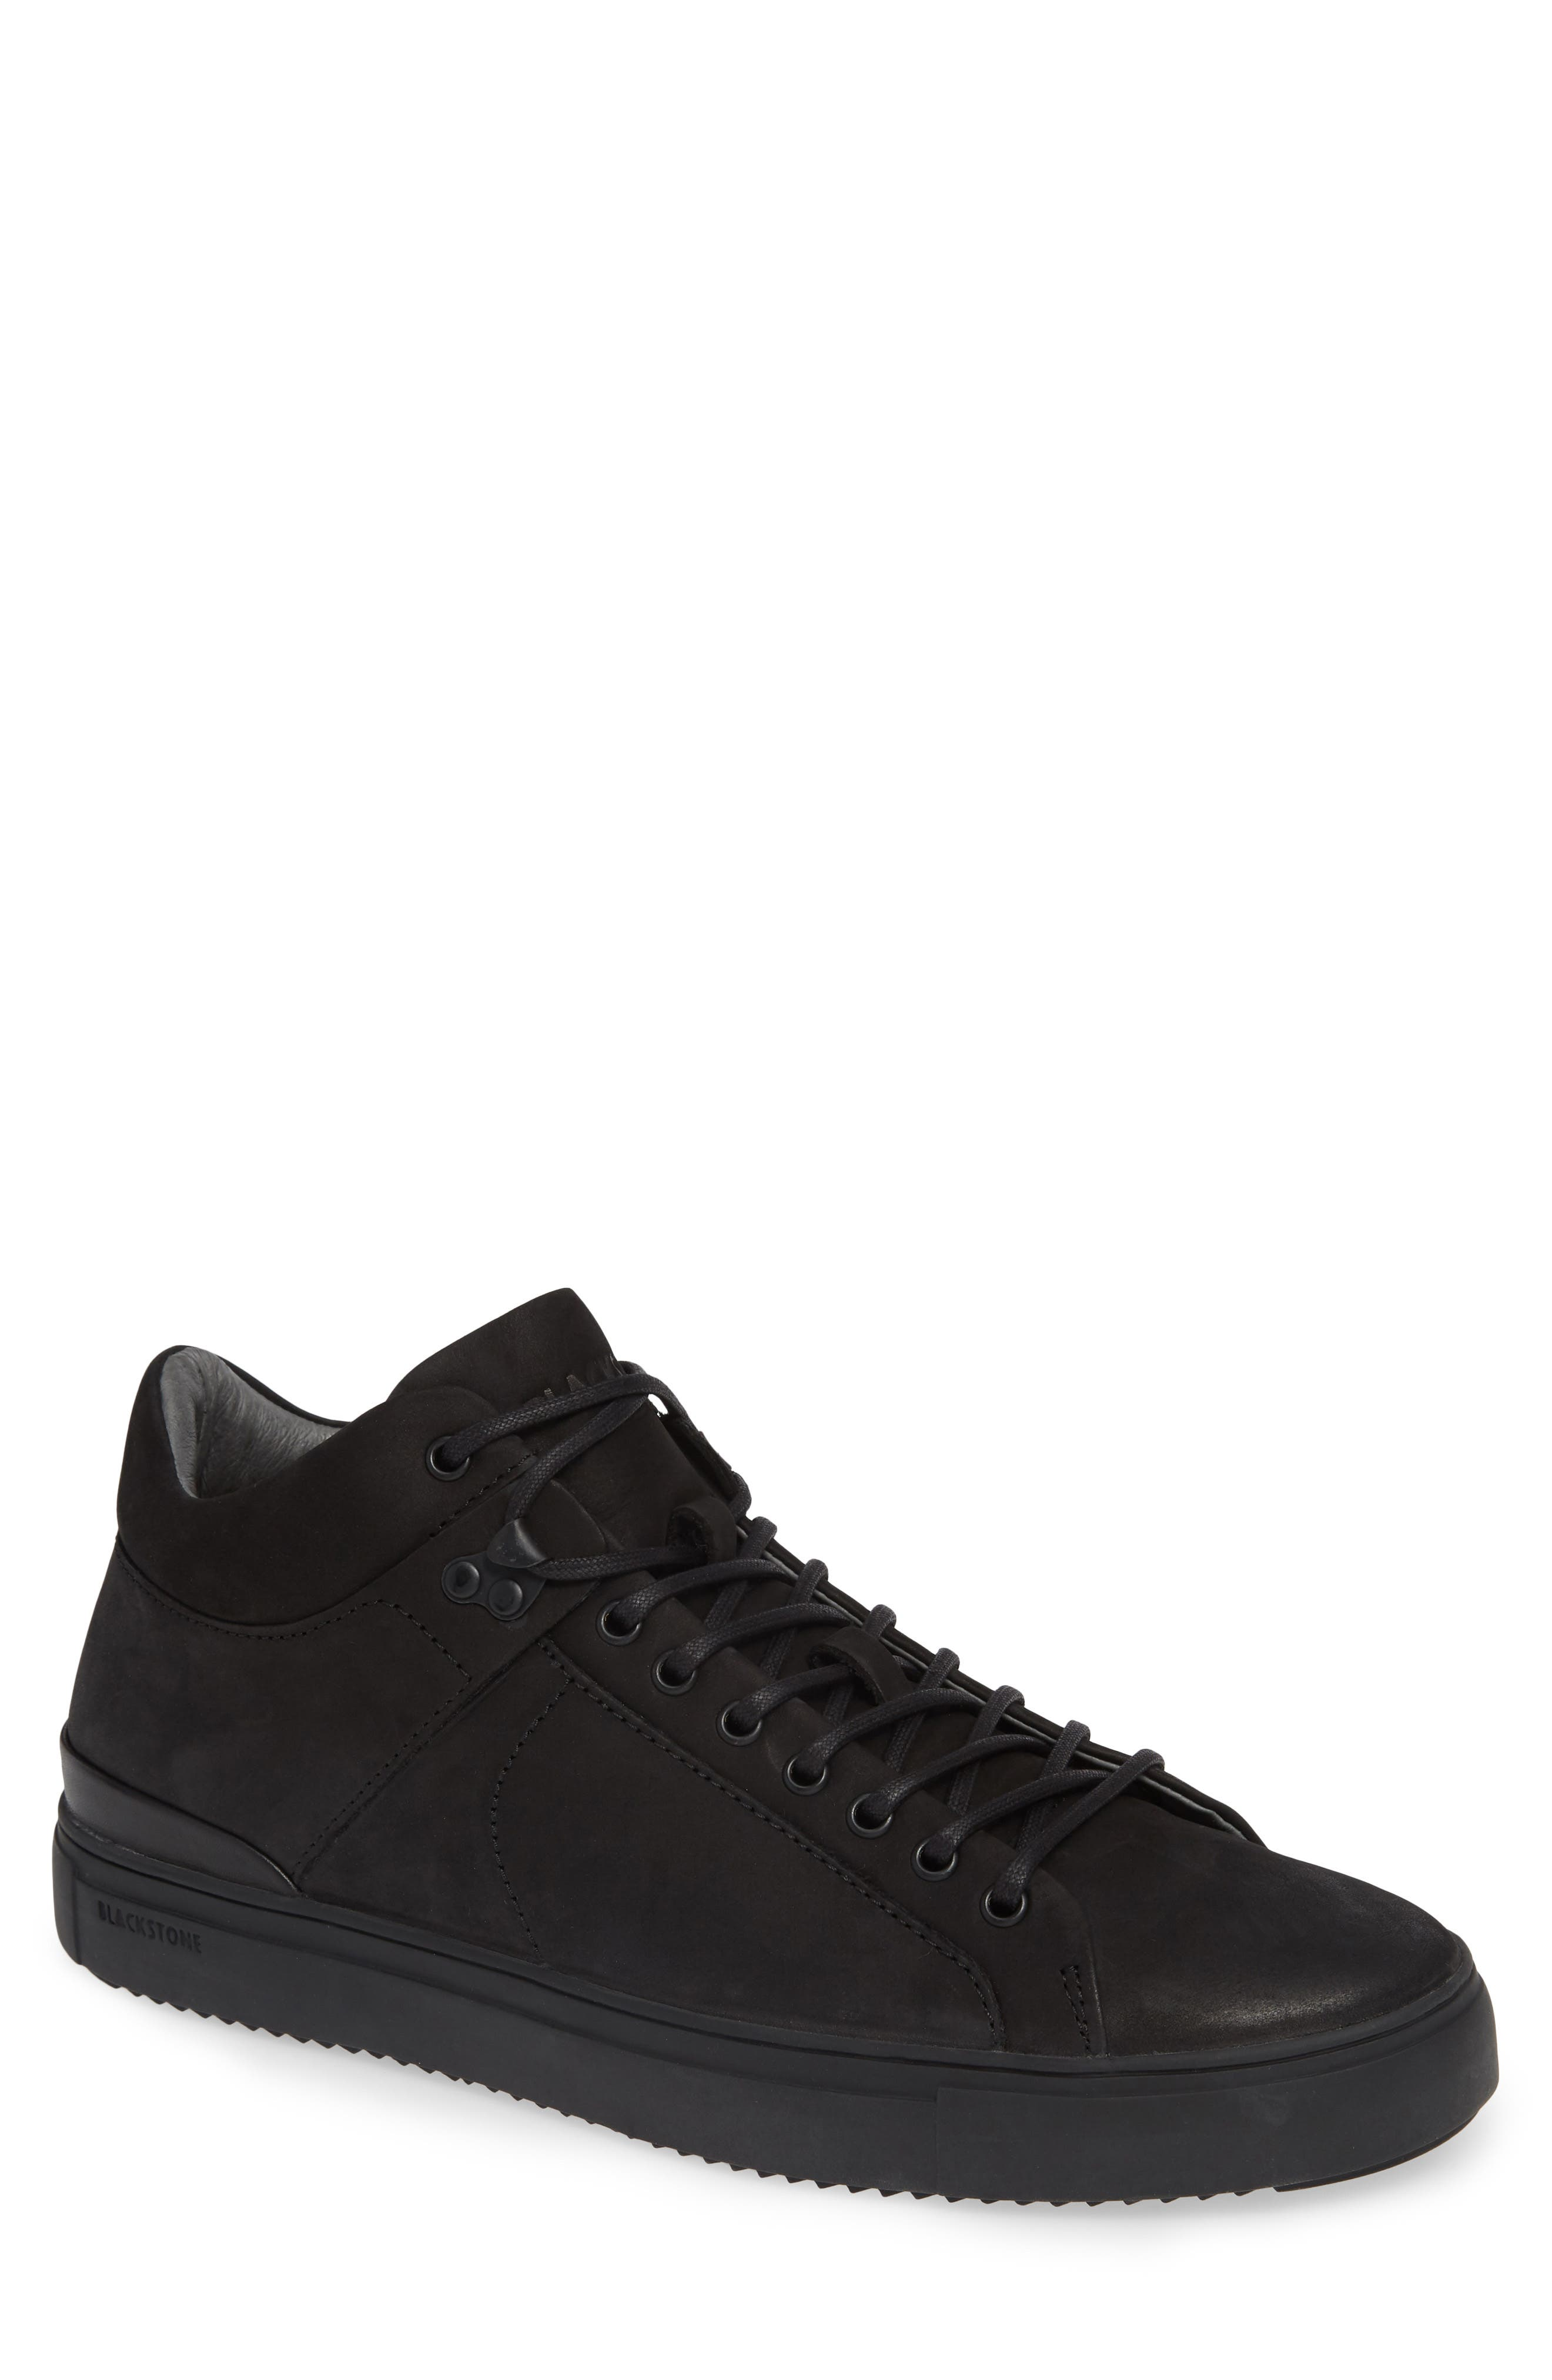 QM87 Sneaker,                             Main thumbnail 1, color,                             BLACK